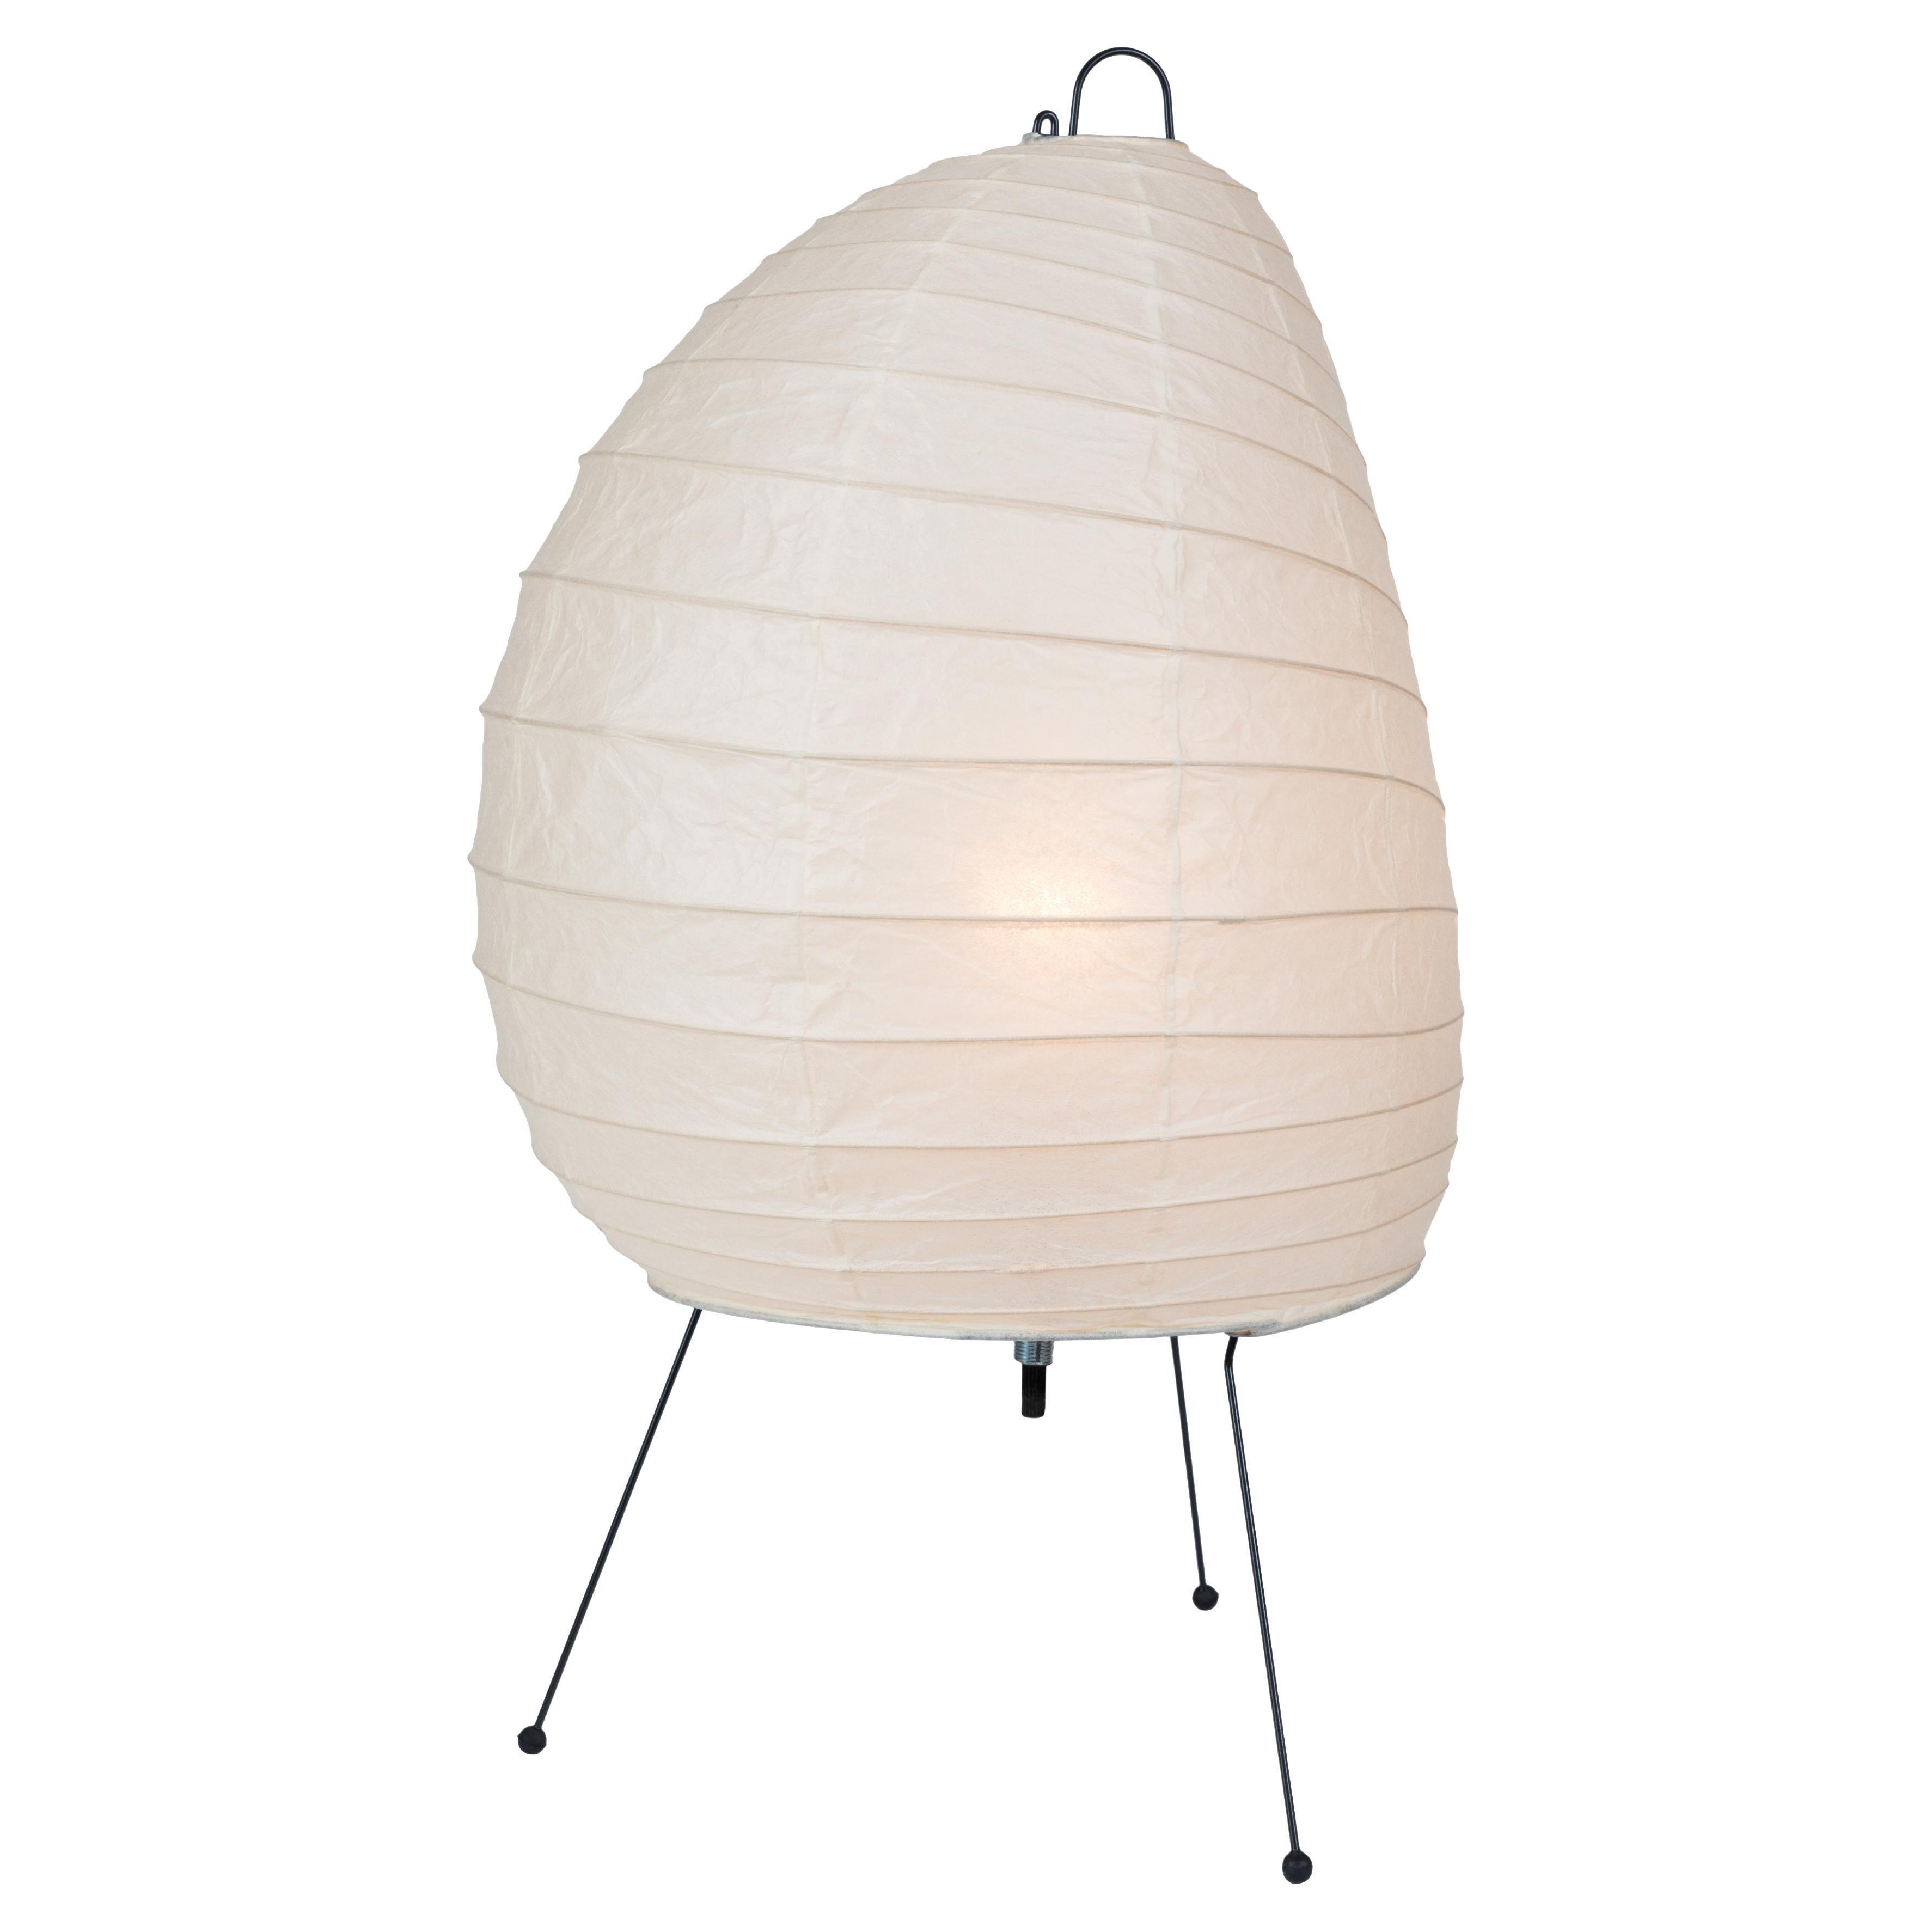 Akari Model 1N Light Sculpture by Isamu Noguchi